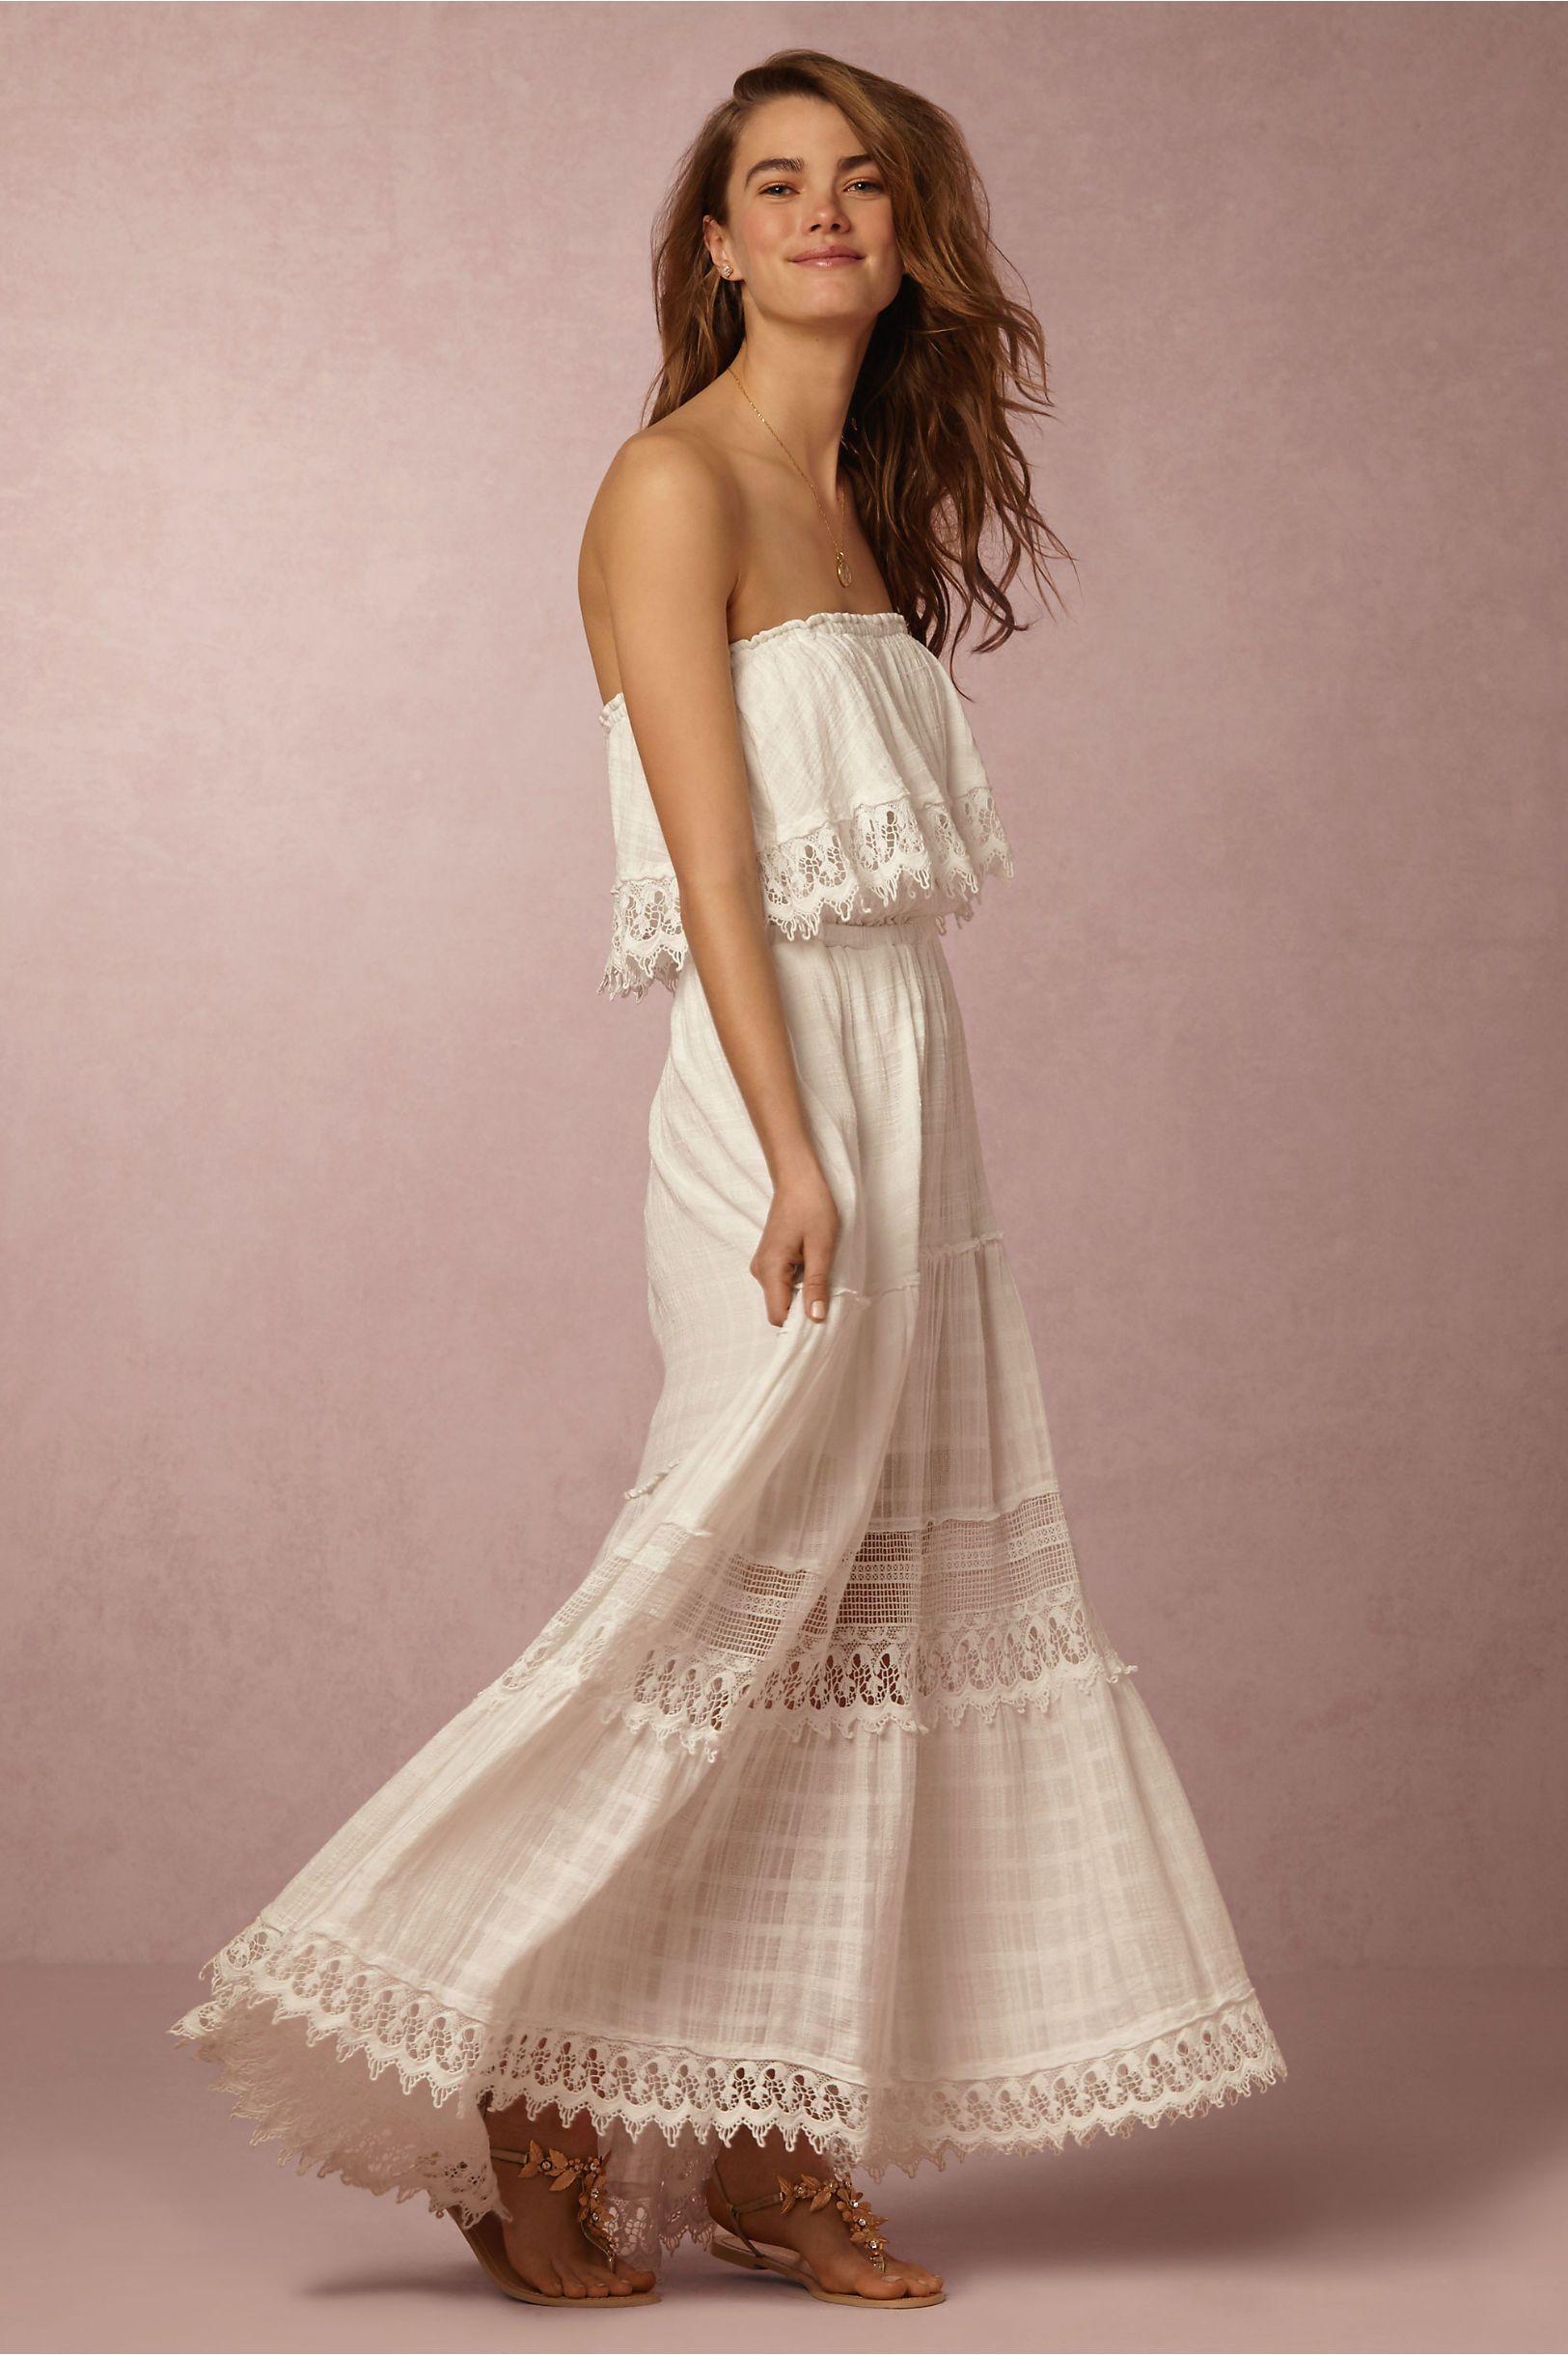 Dorable Vestido De Novia Ricky Williams Modelo - Ideas de Estilos de ...